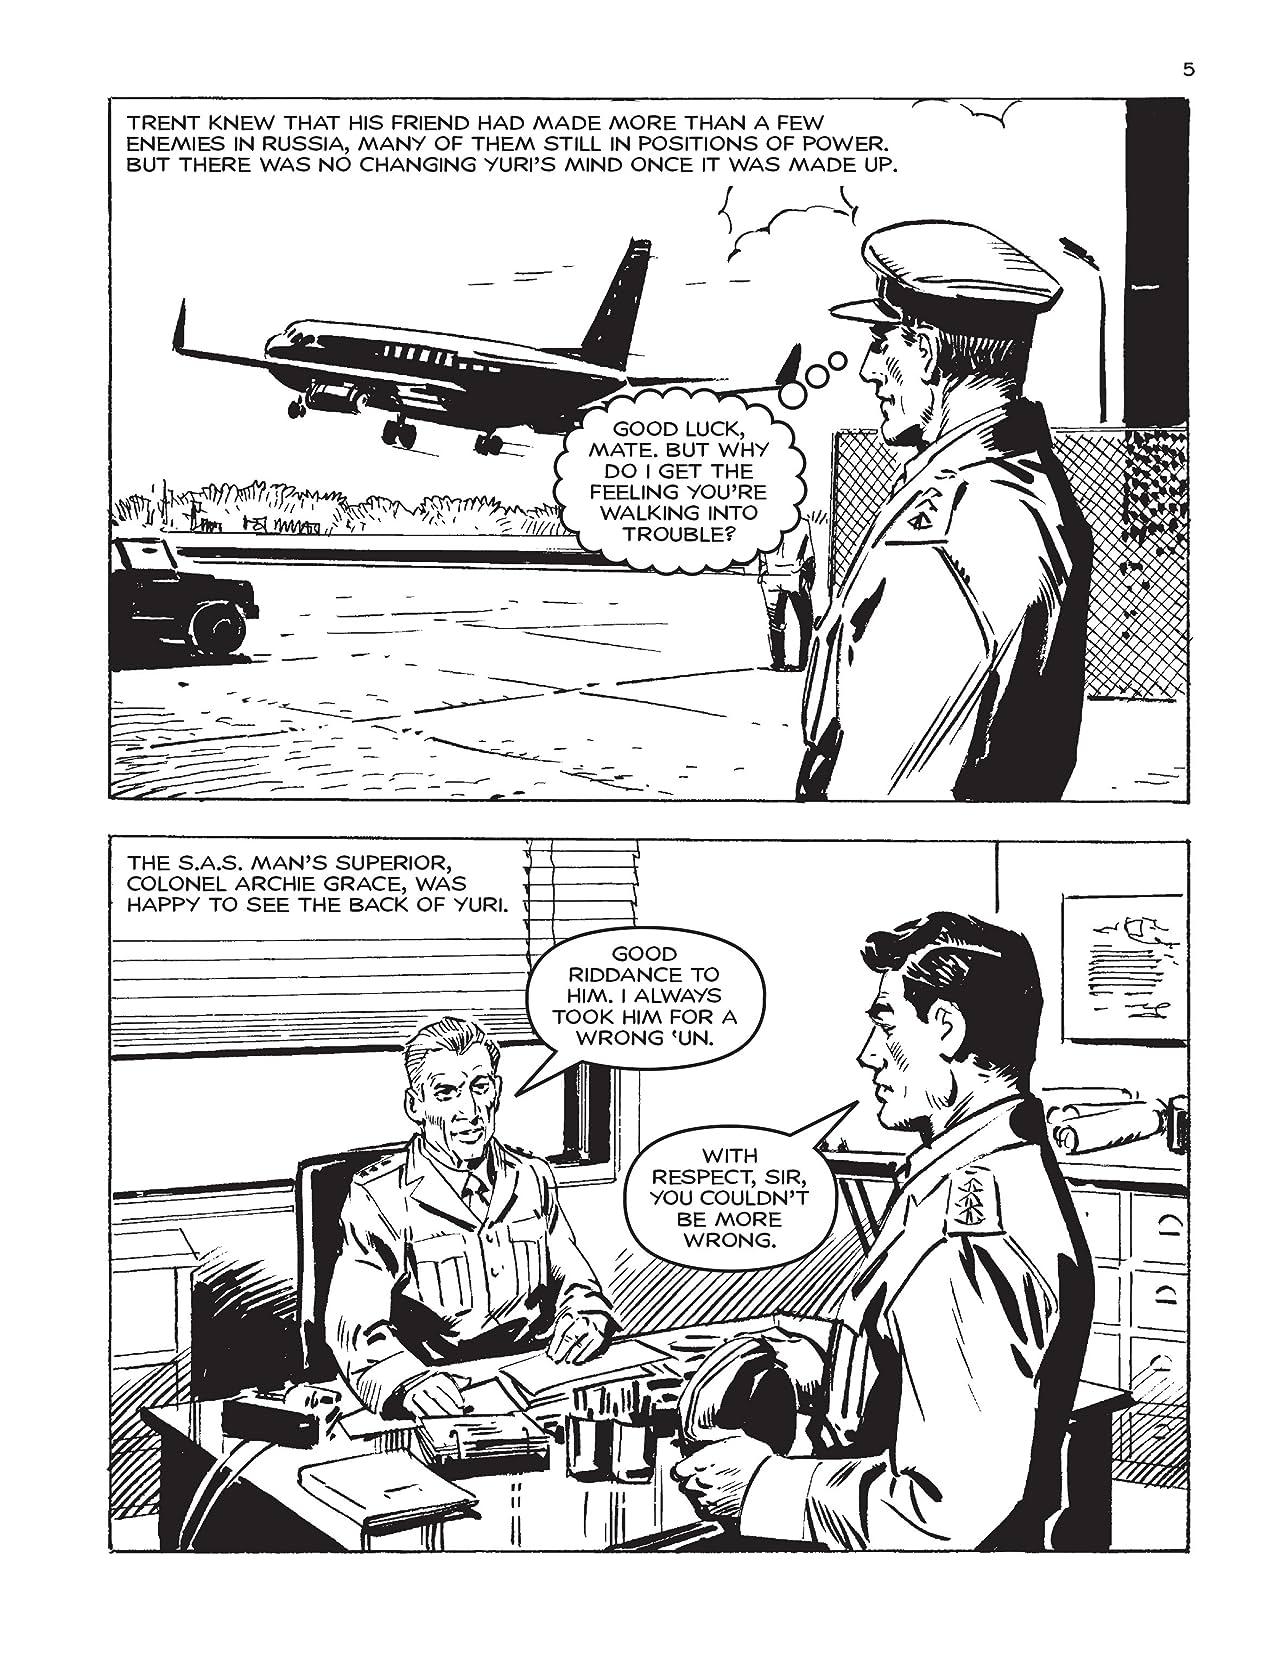 Commando #4957: Yuri's Return